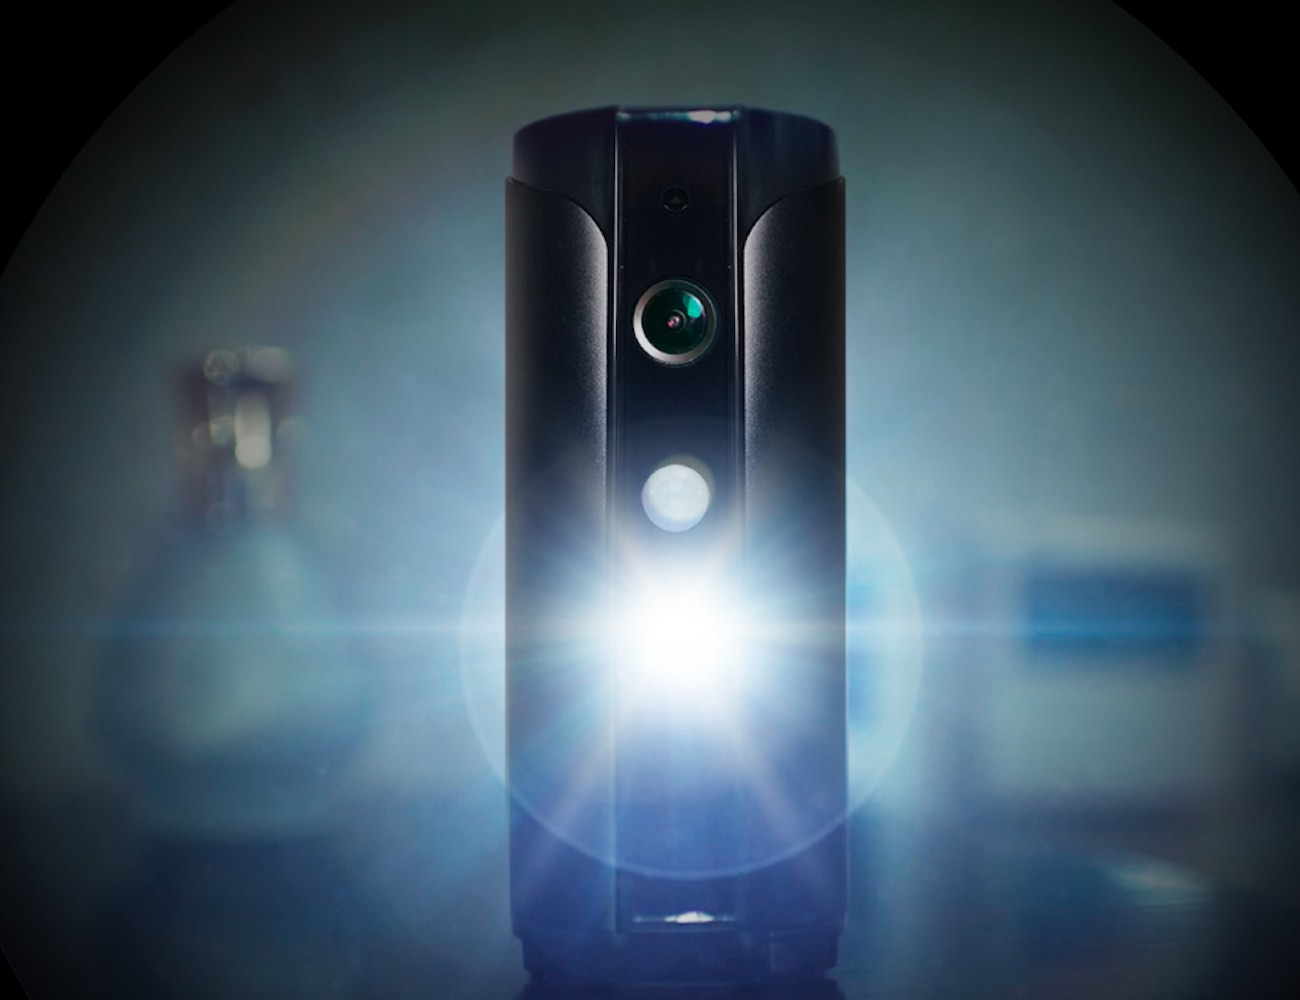 The Carehub Camera/Monitor